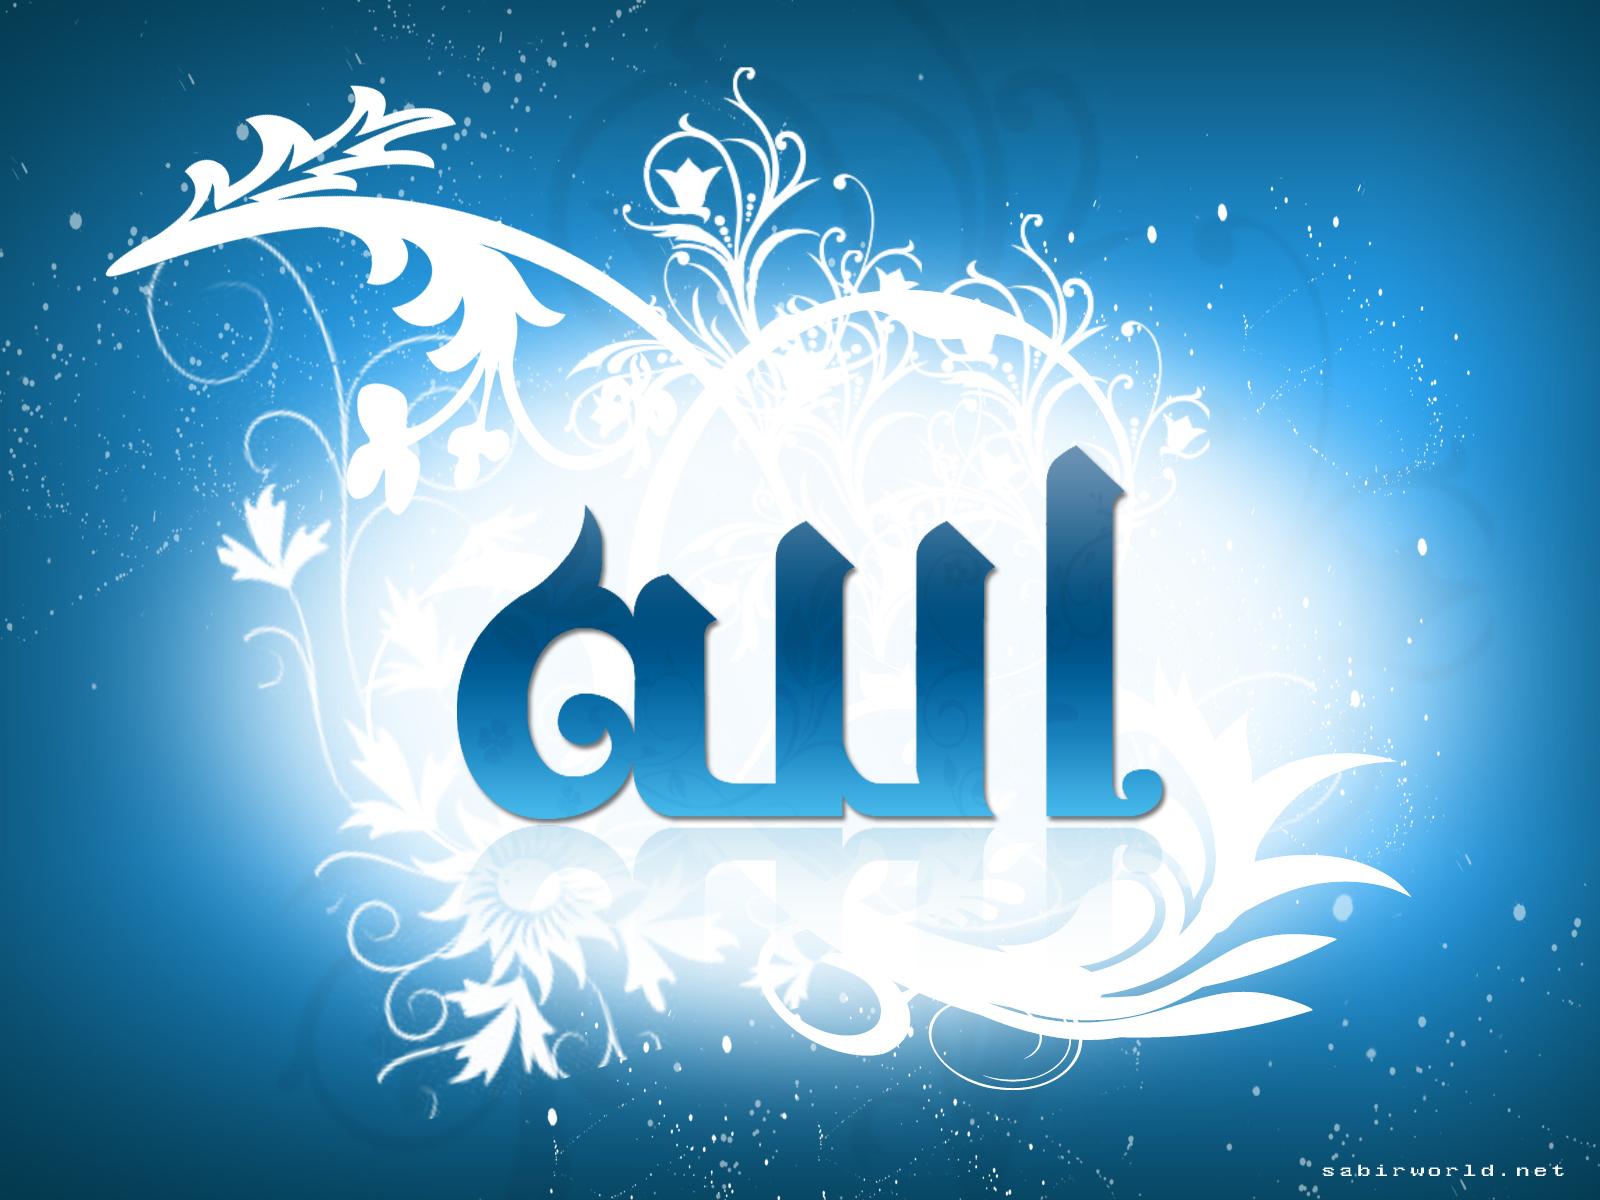 http://4.bp.blogspot.com/-WaGdasdzWF0/UMHCRWAiM5I/AAAAAAAALtE/66K9S_8mGBU/s1600/Islamic+Wallpaper+(7).jpg